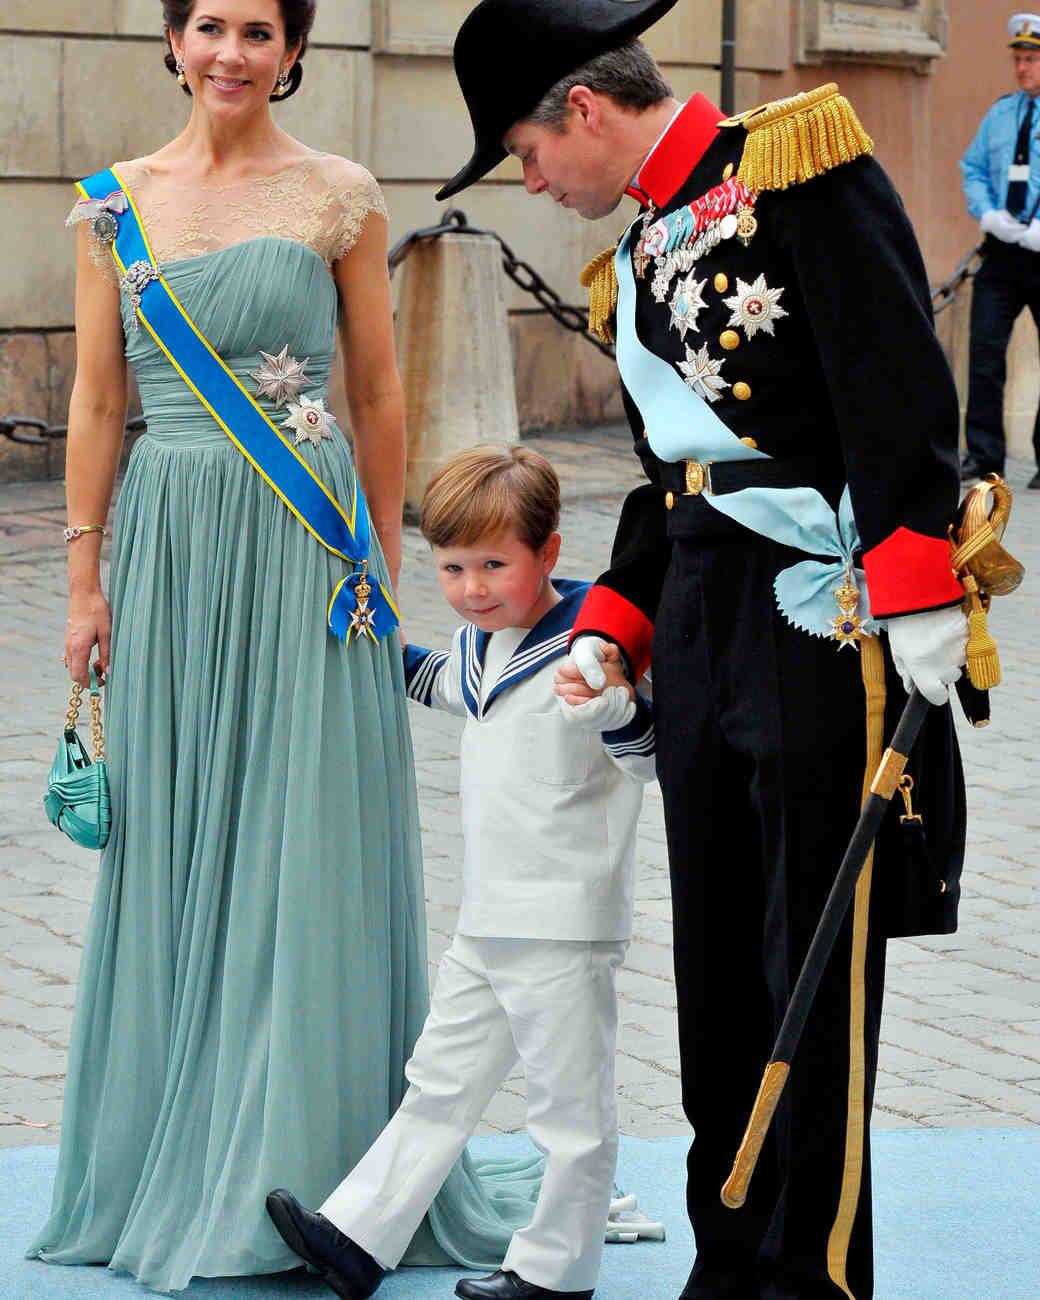 royal-children-wedding4501288-10-0415.jpg